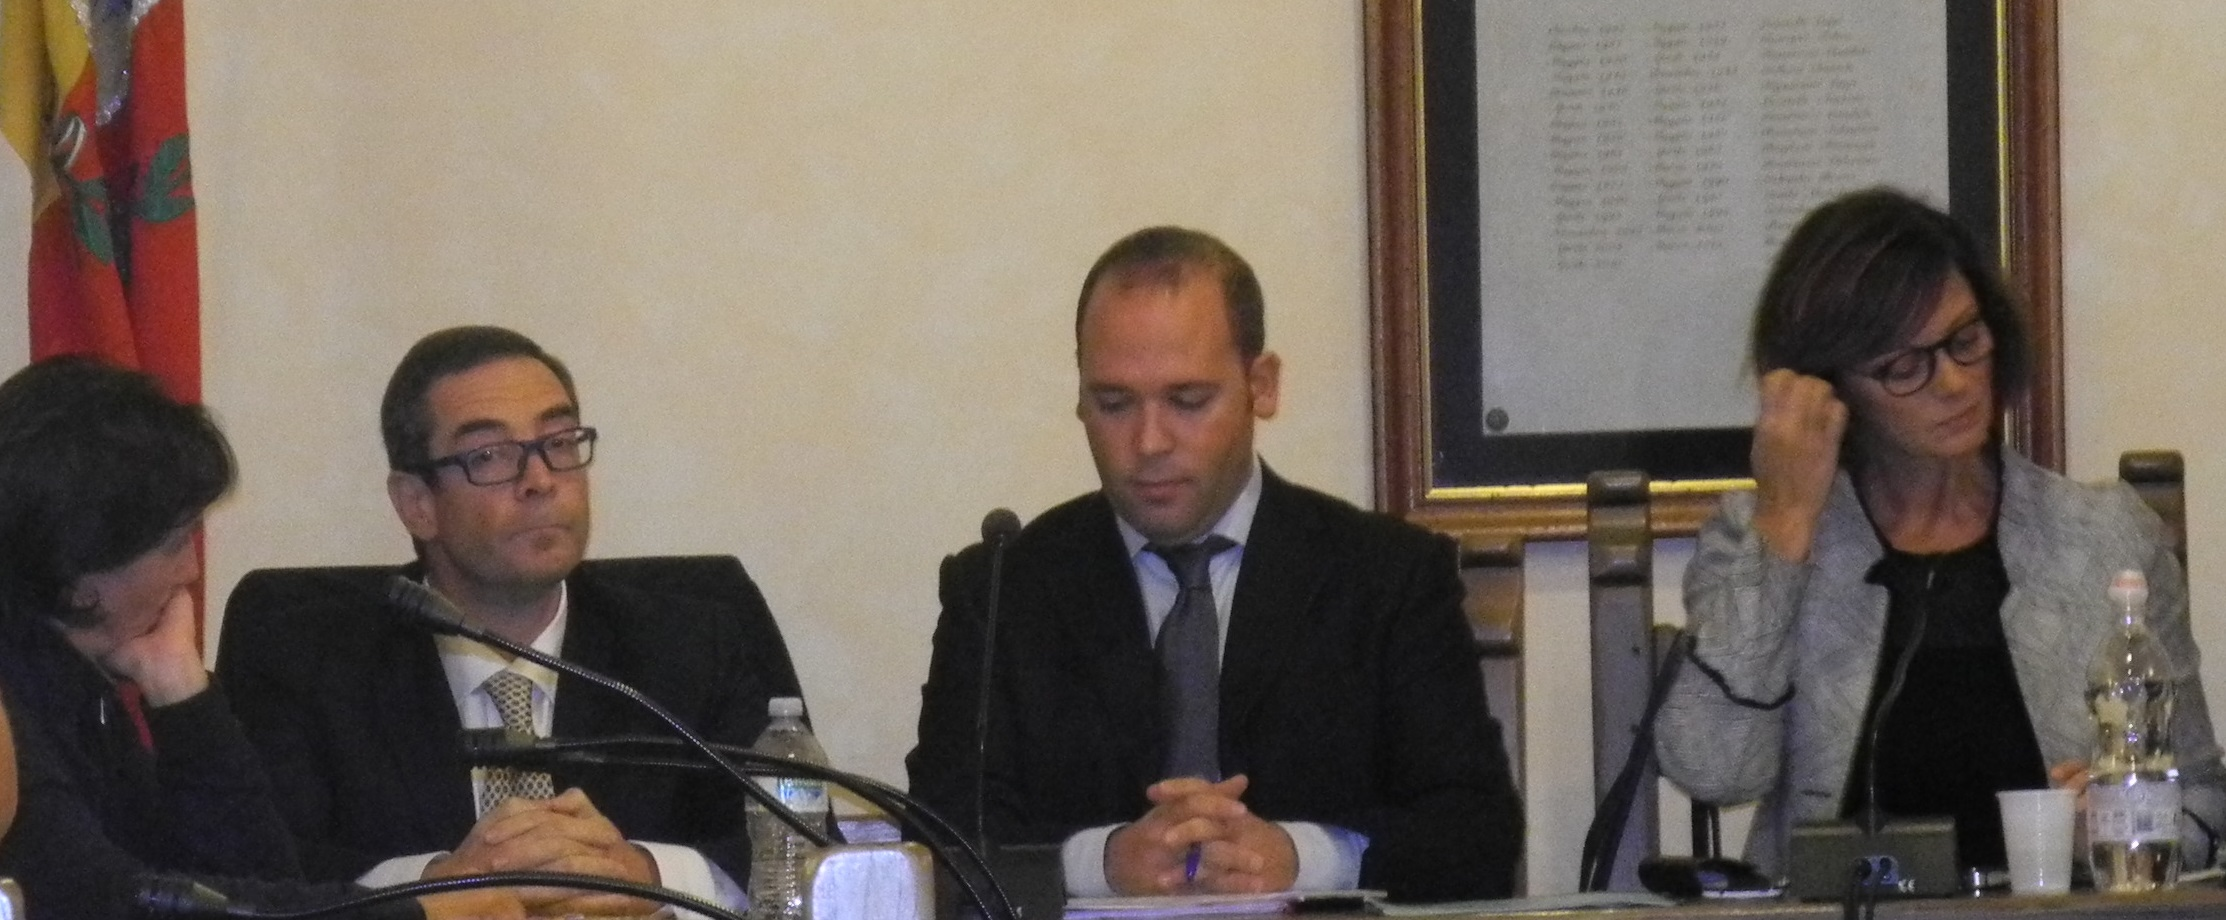 http://www.ballabionews.com/wordpress/wp-content/uploads/2017/10/Simonetti-consiglio-Ballabio.jpg